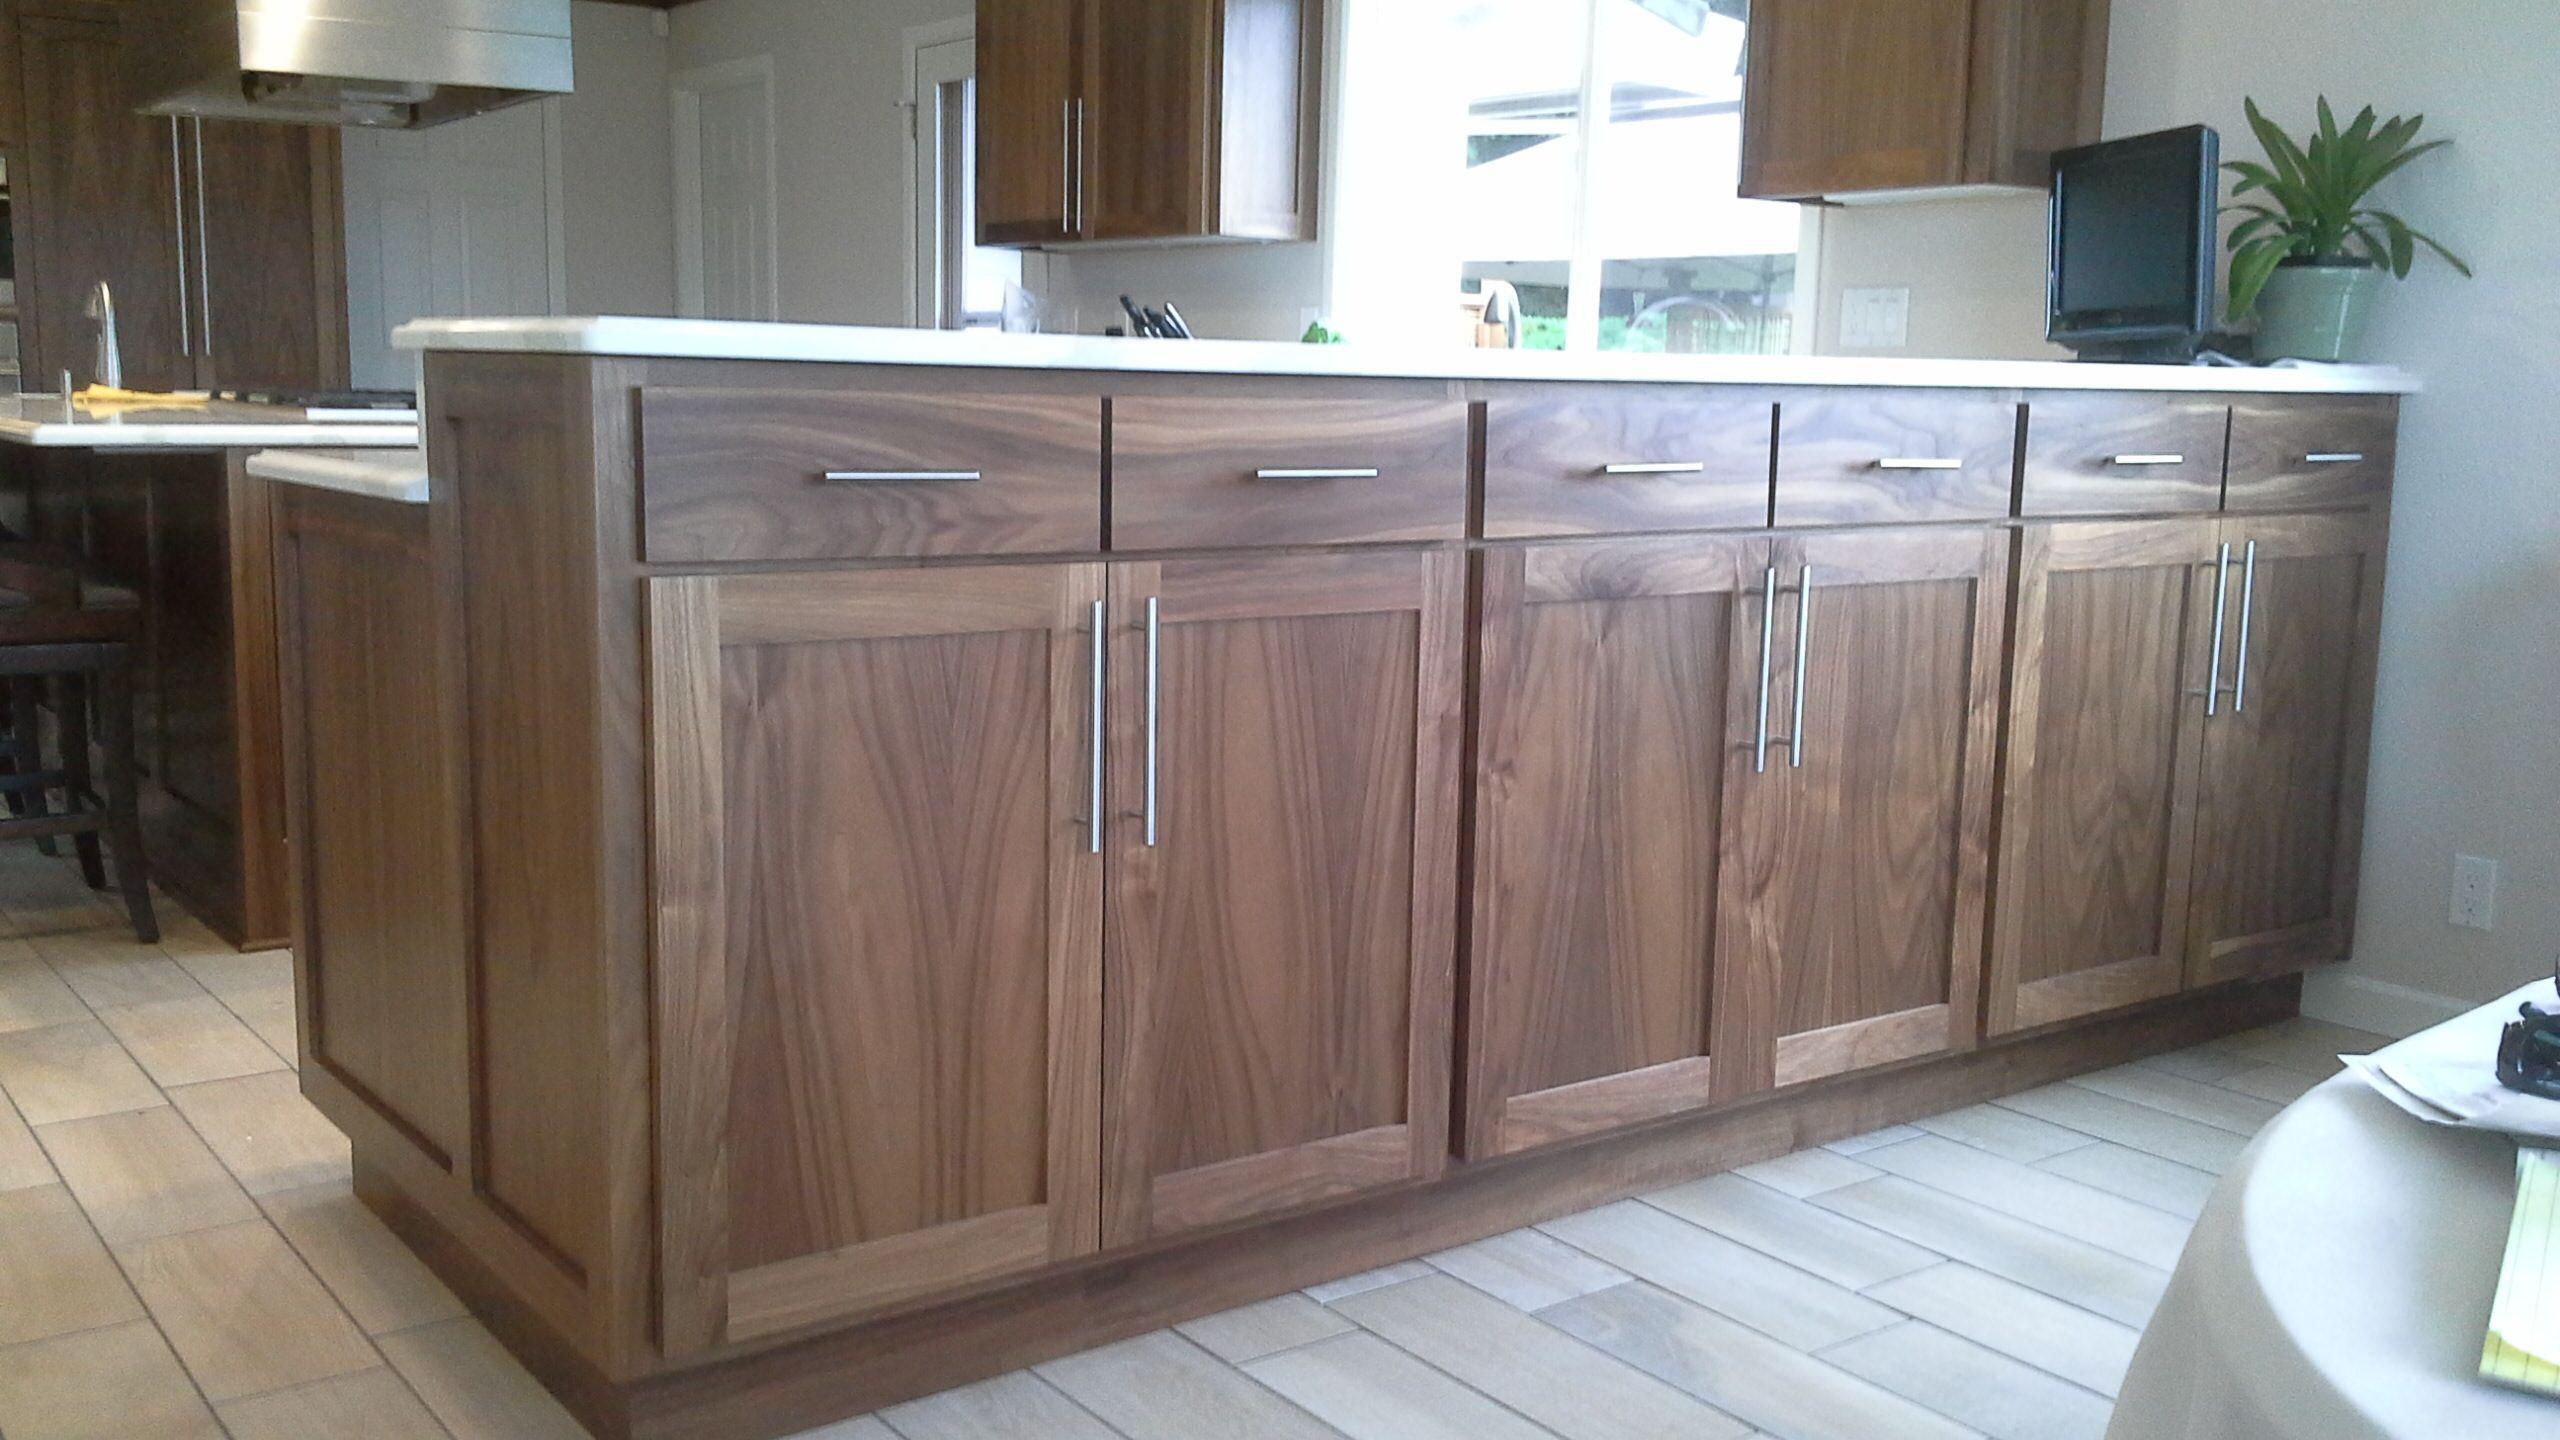 See Our Work Cornerstone Cabinetry Fine Craftsmanship Attention To Detail Black Kitchen Cabinets Walnut Kitchen Cabinets Cost Of Kitchen Cabinets